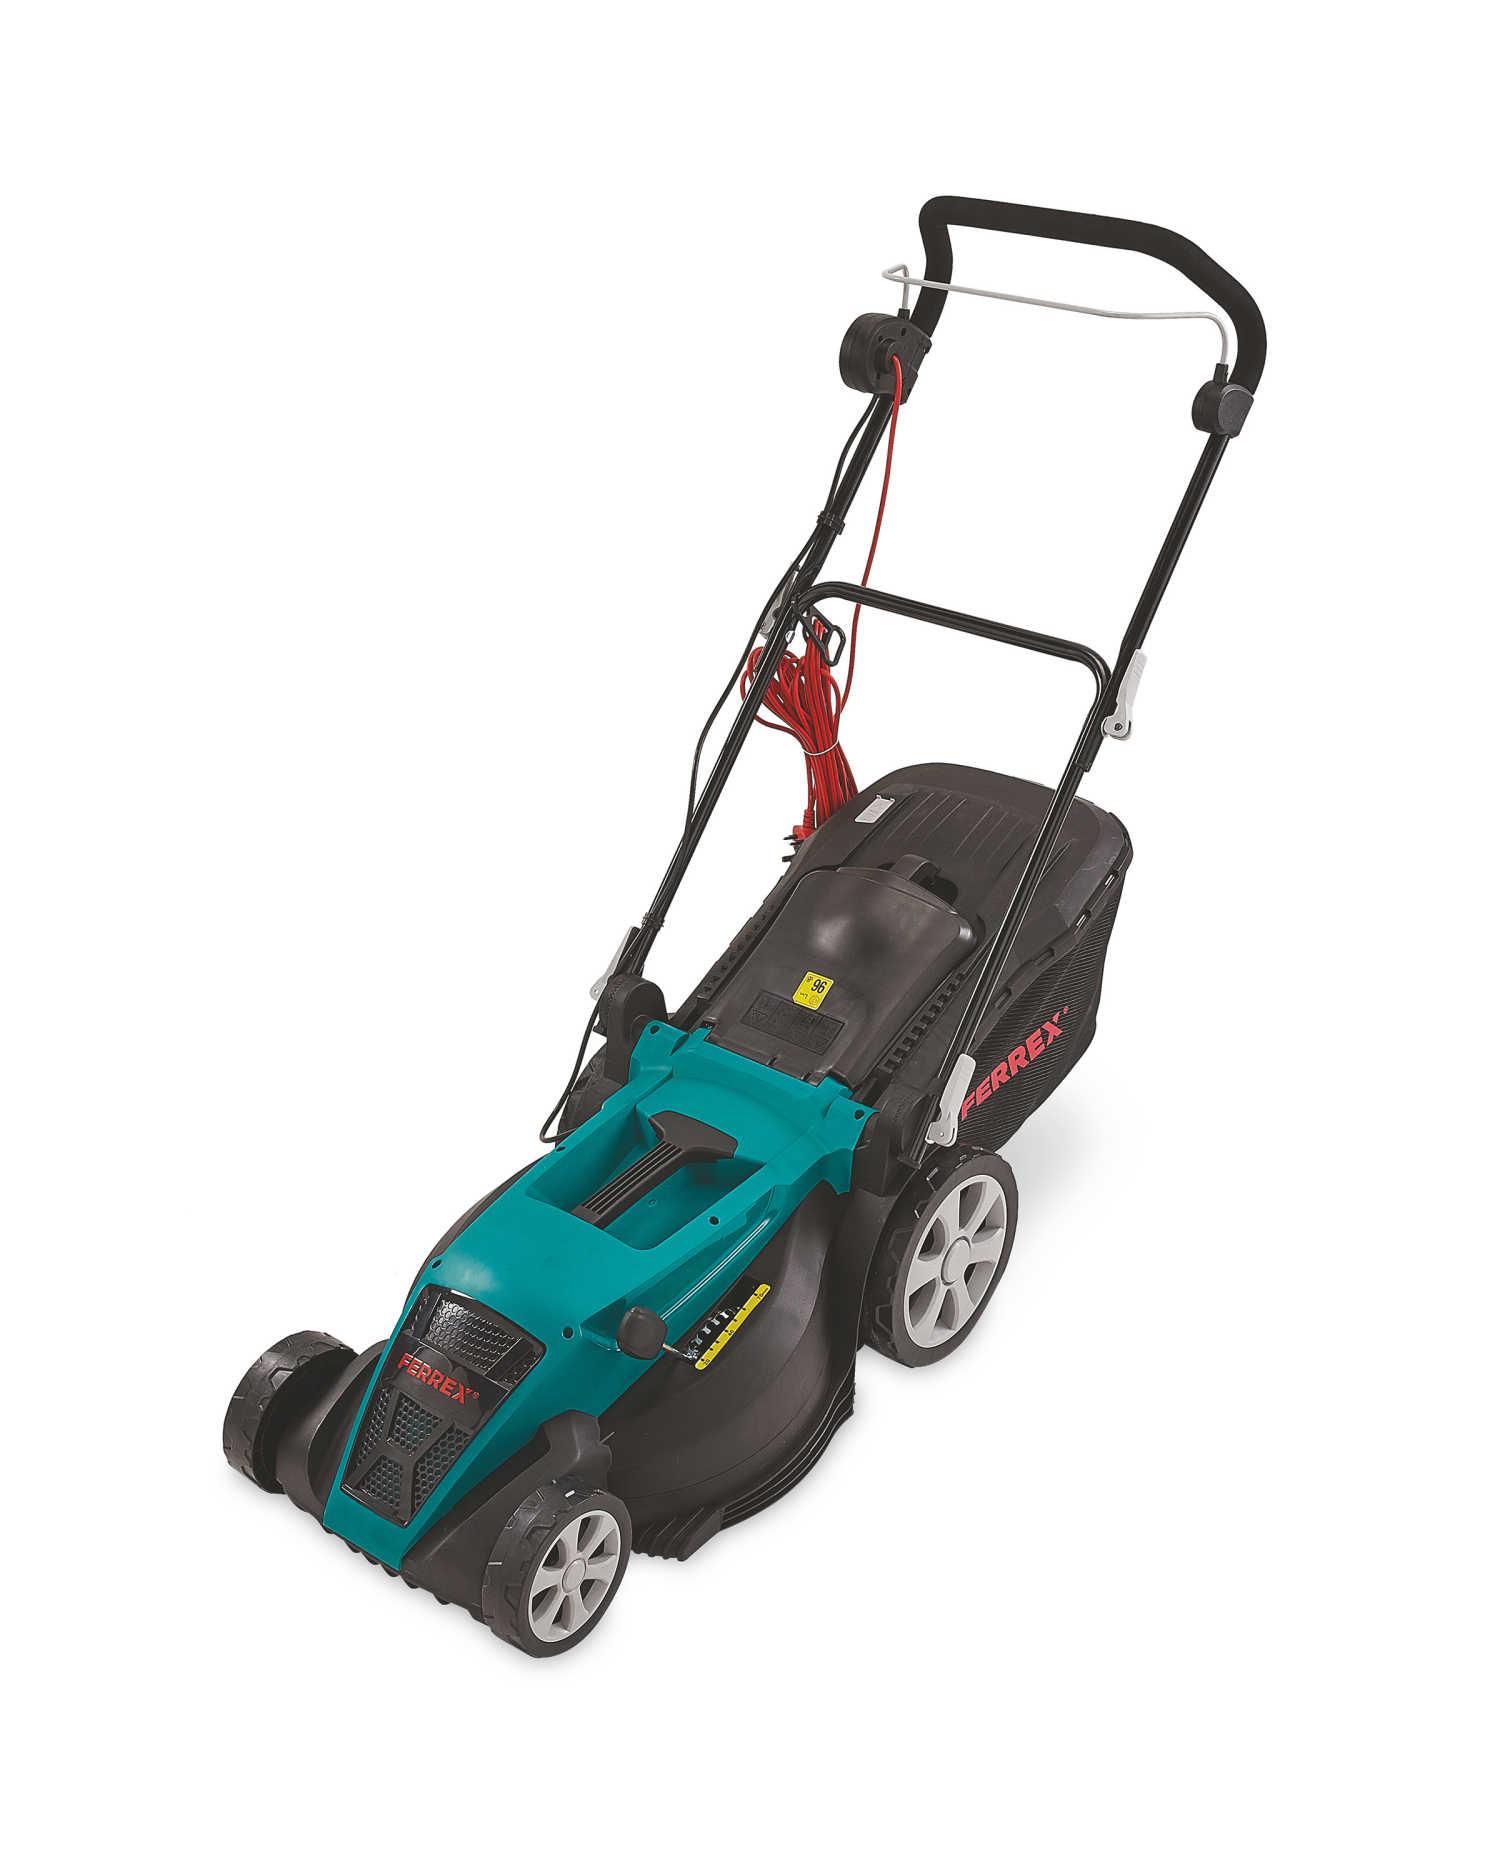 Ferrex Electric Lawnmower inc. 3 Year Warranty £79.99 delivered @ Aldi